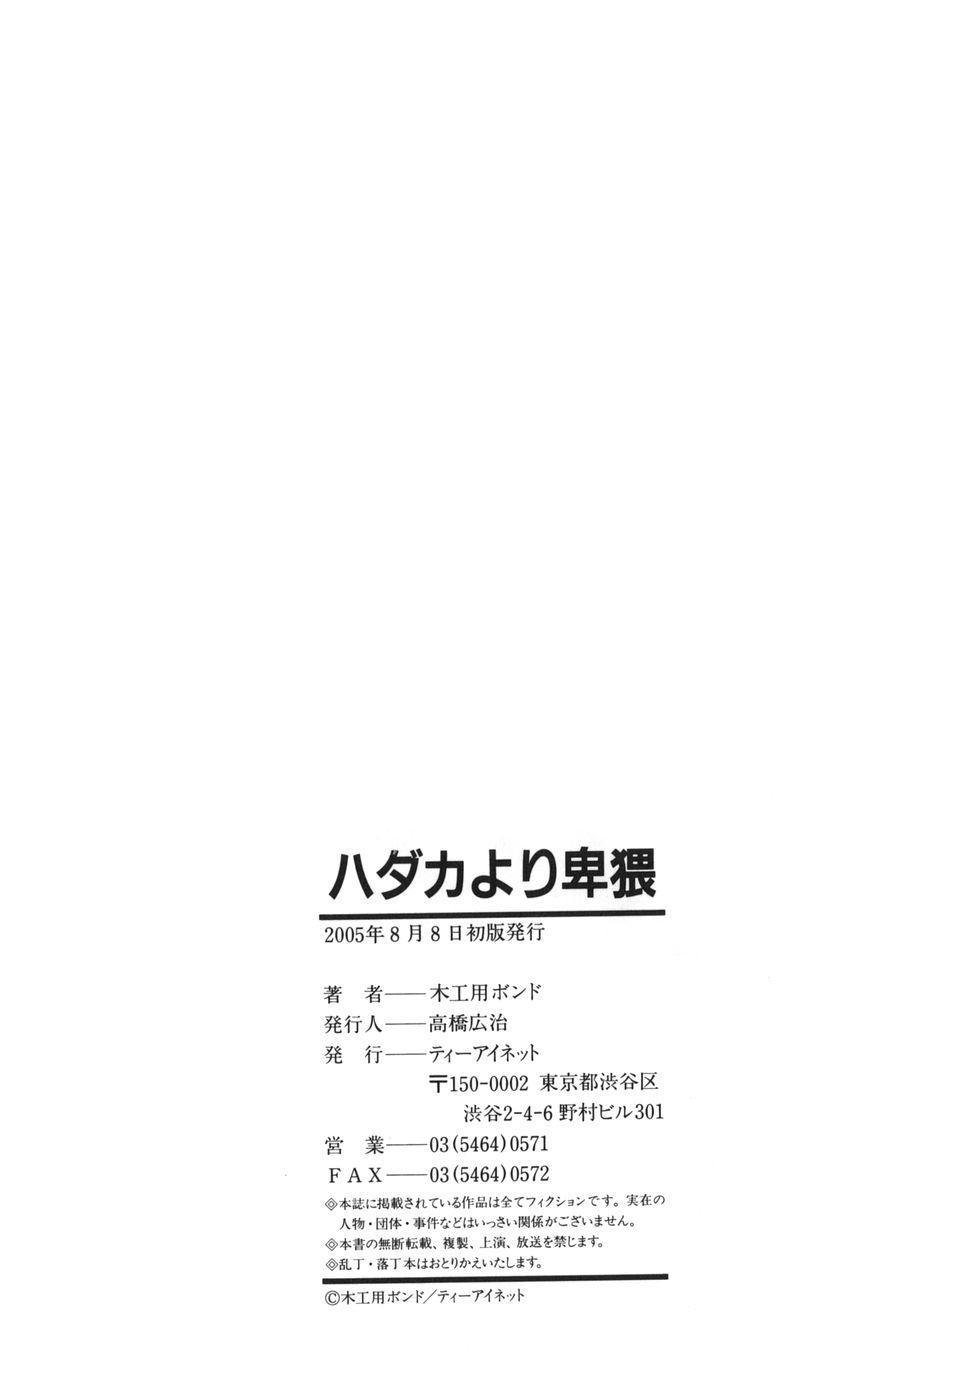 Hadaka Yori Hiwai - She is dirtier than nakedness 183